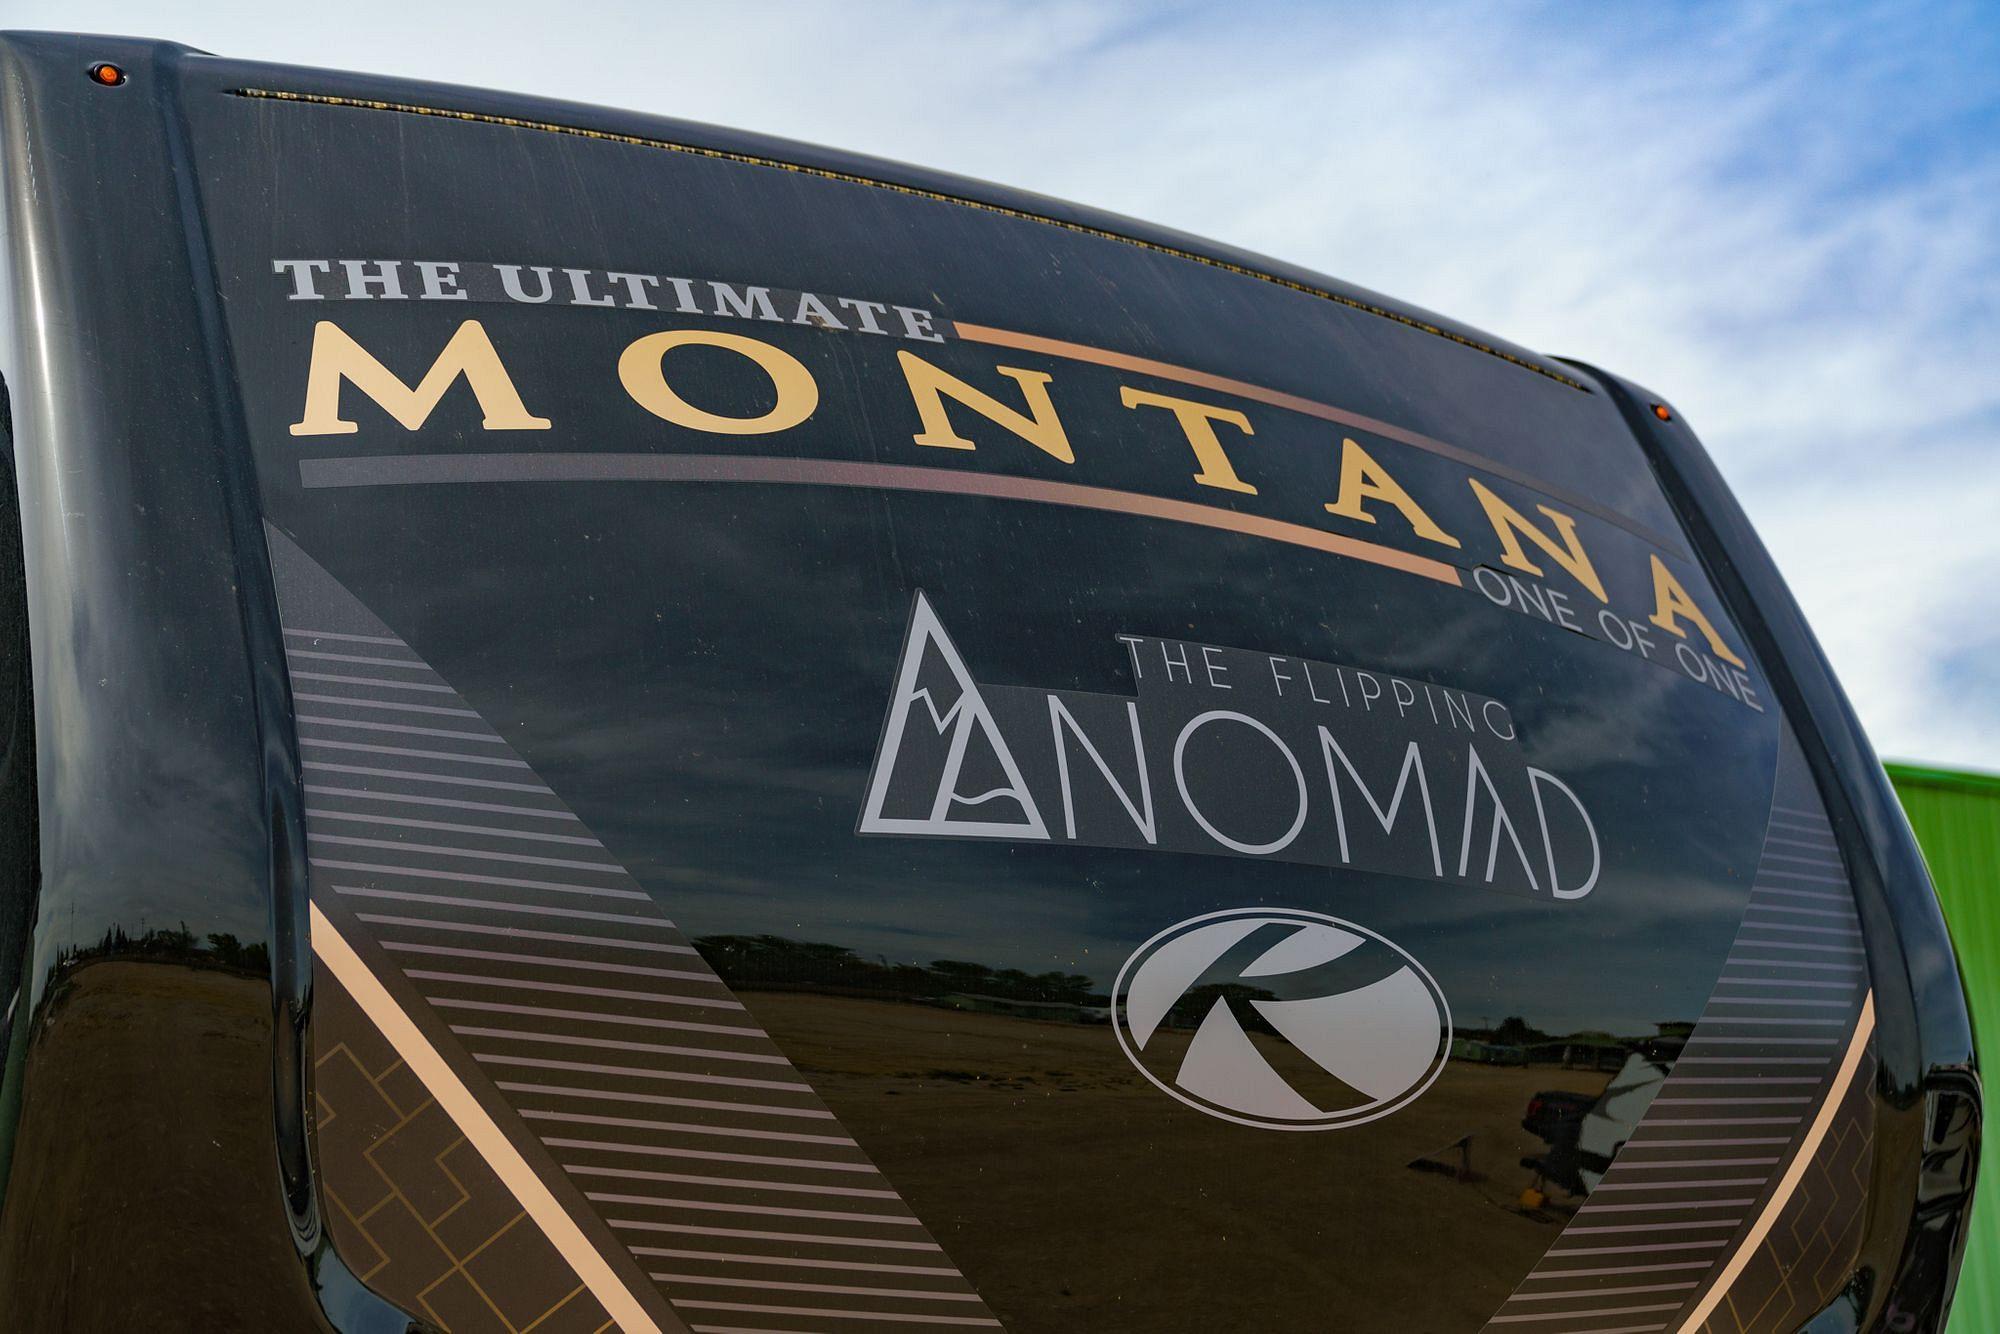 Ultimate Montana Flipping Nomad